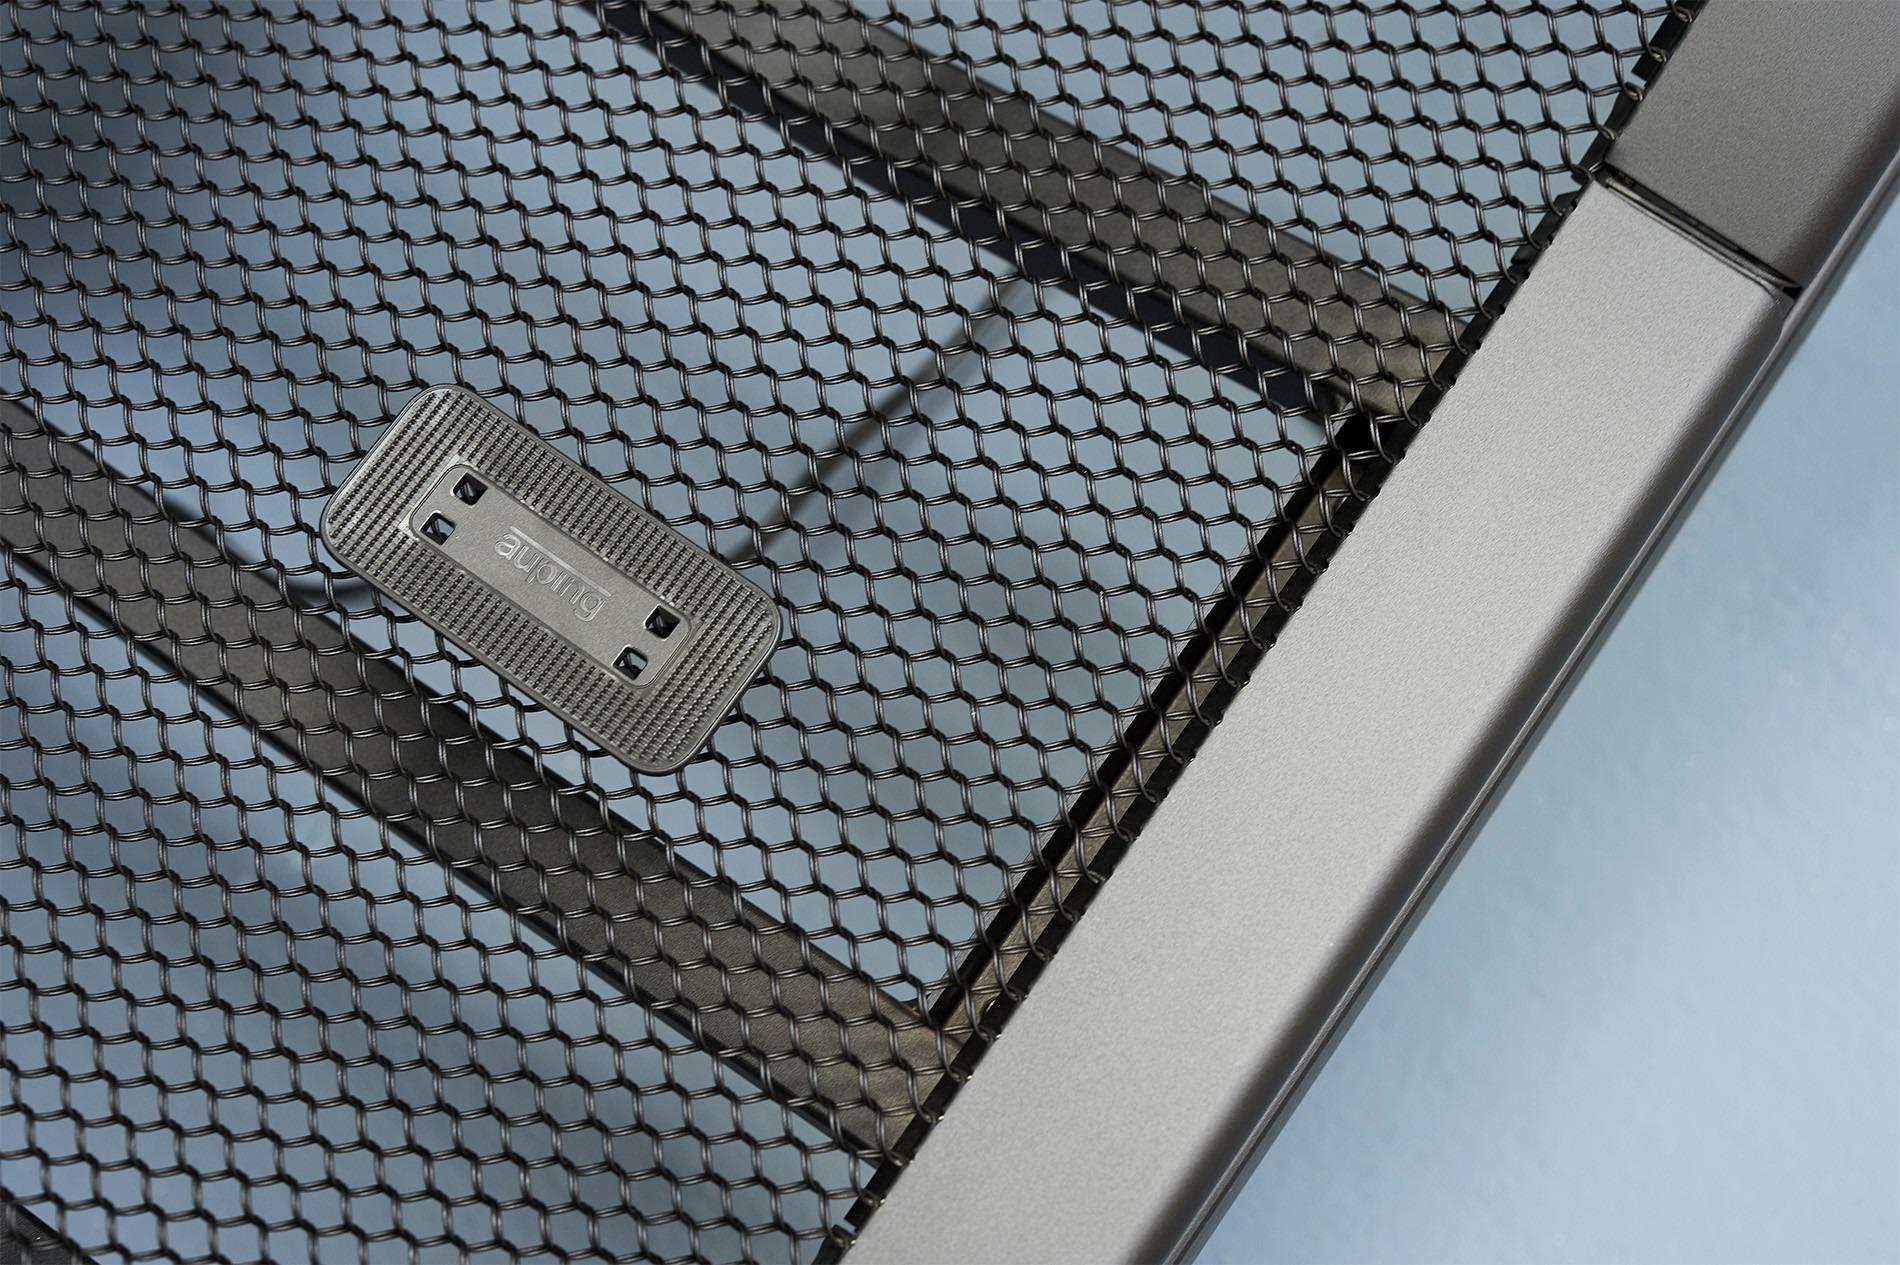 auping mesh base